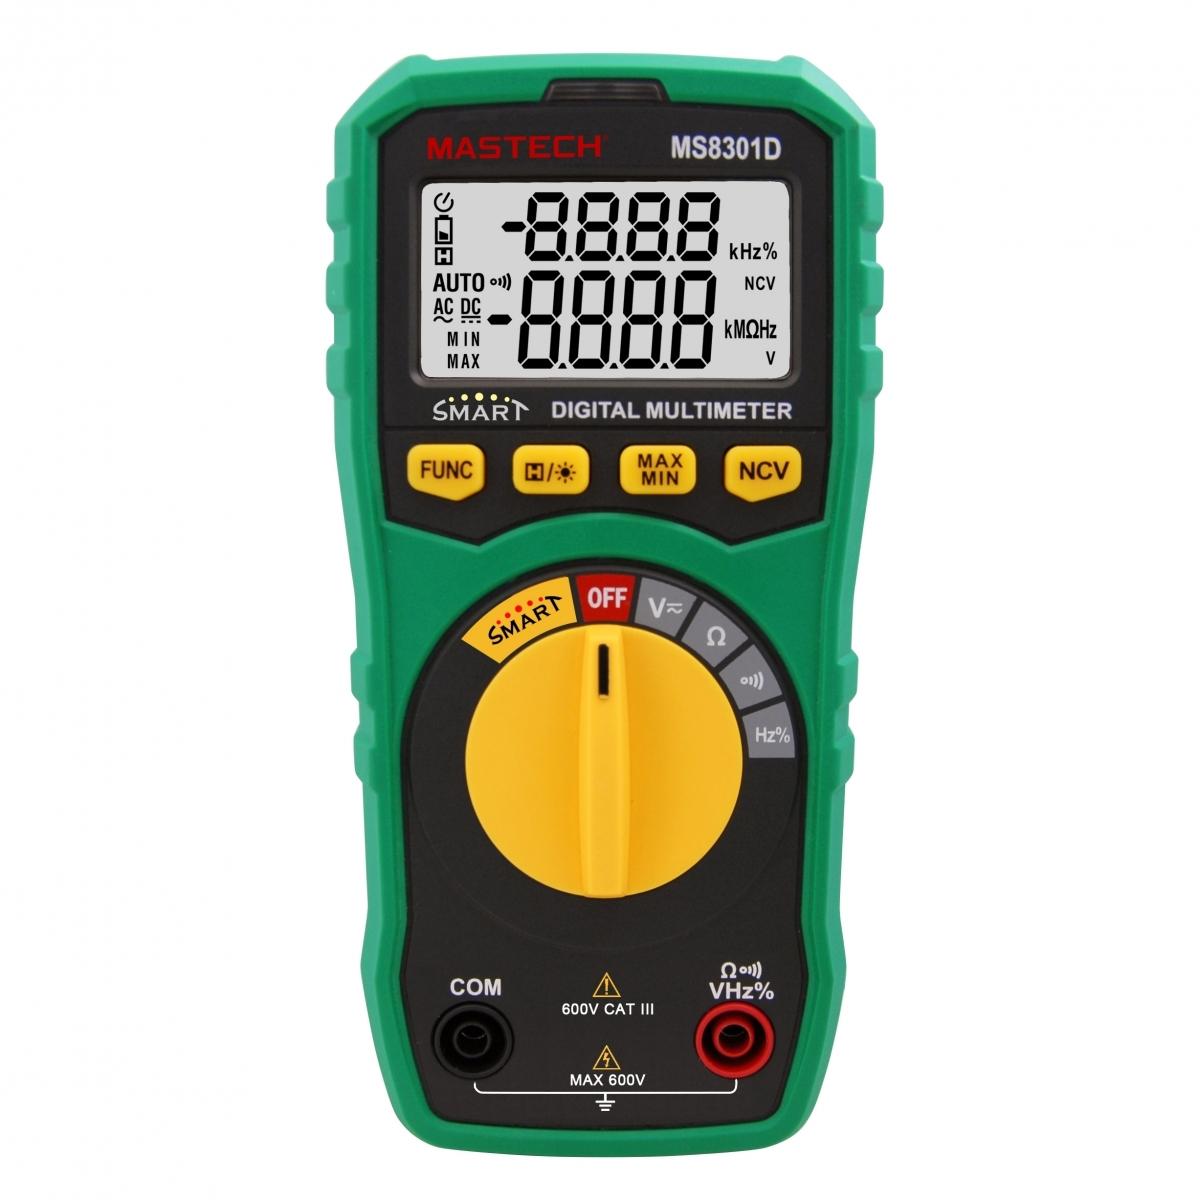 Mastech MS8301D Smart Digital Multimeter